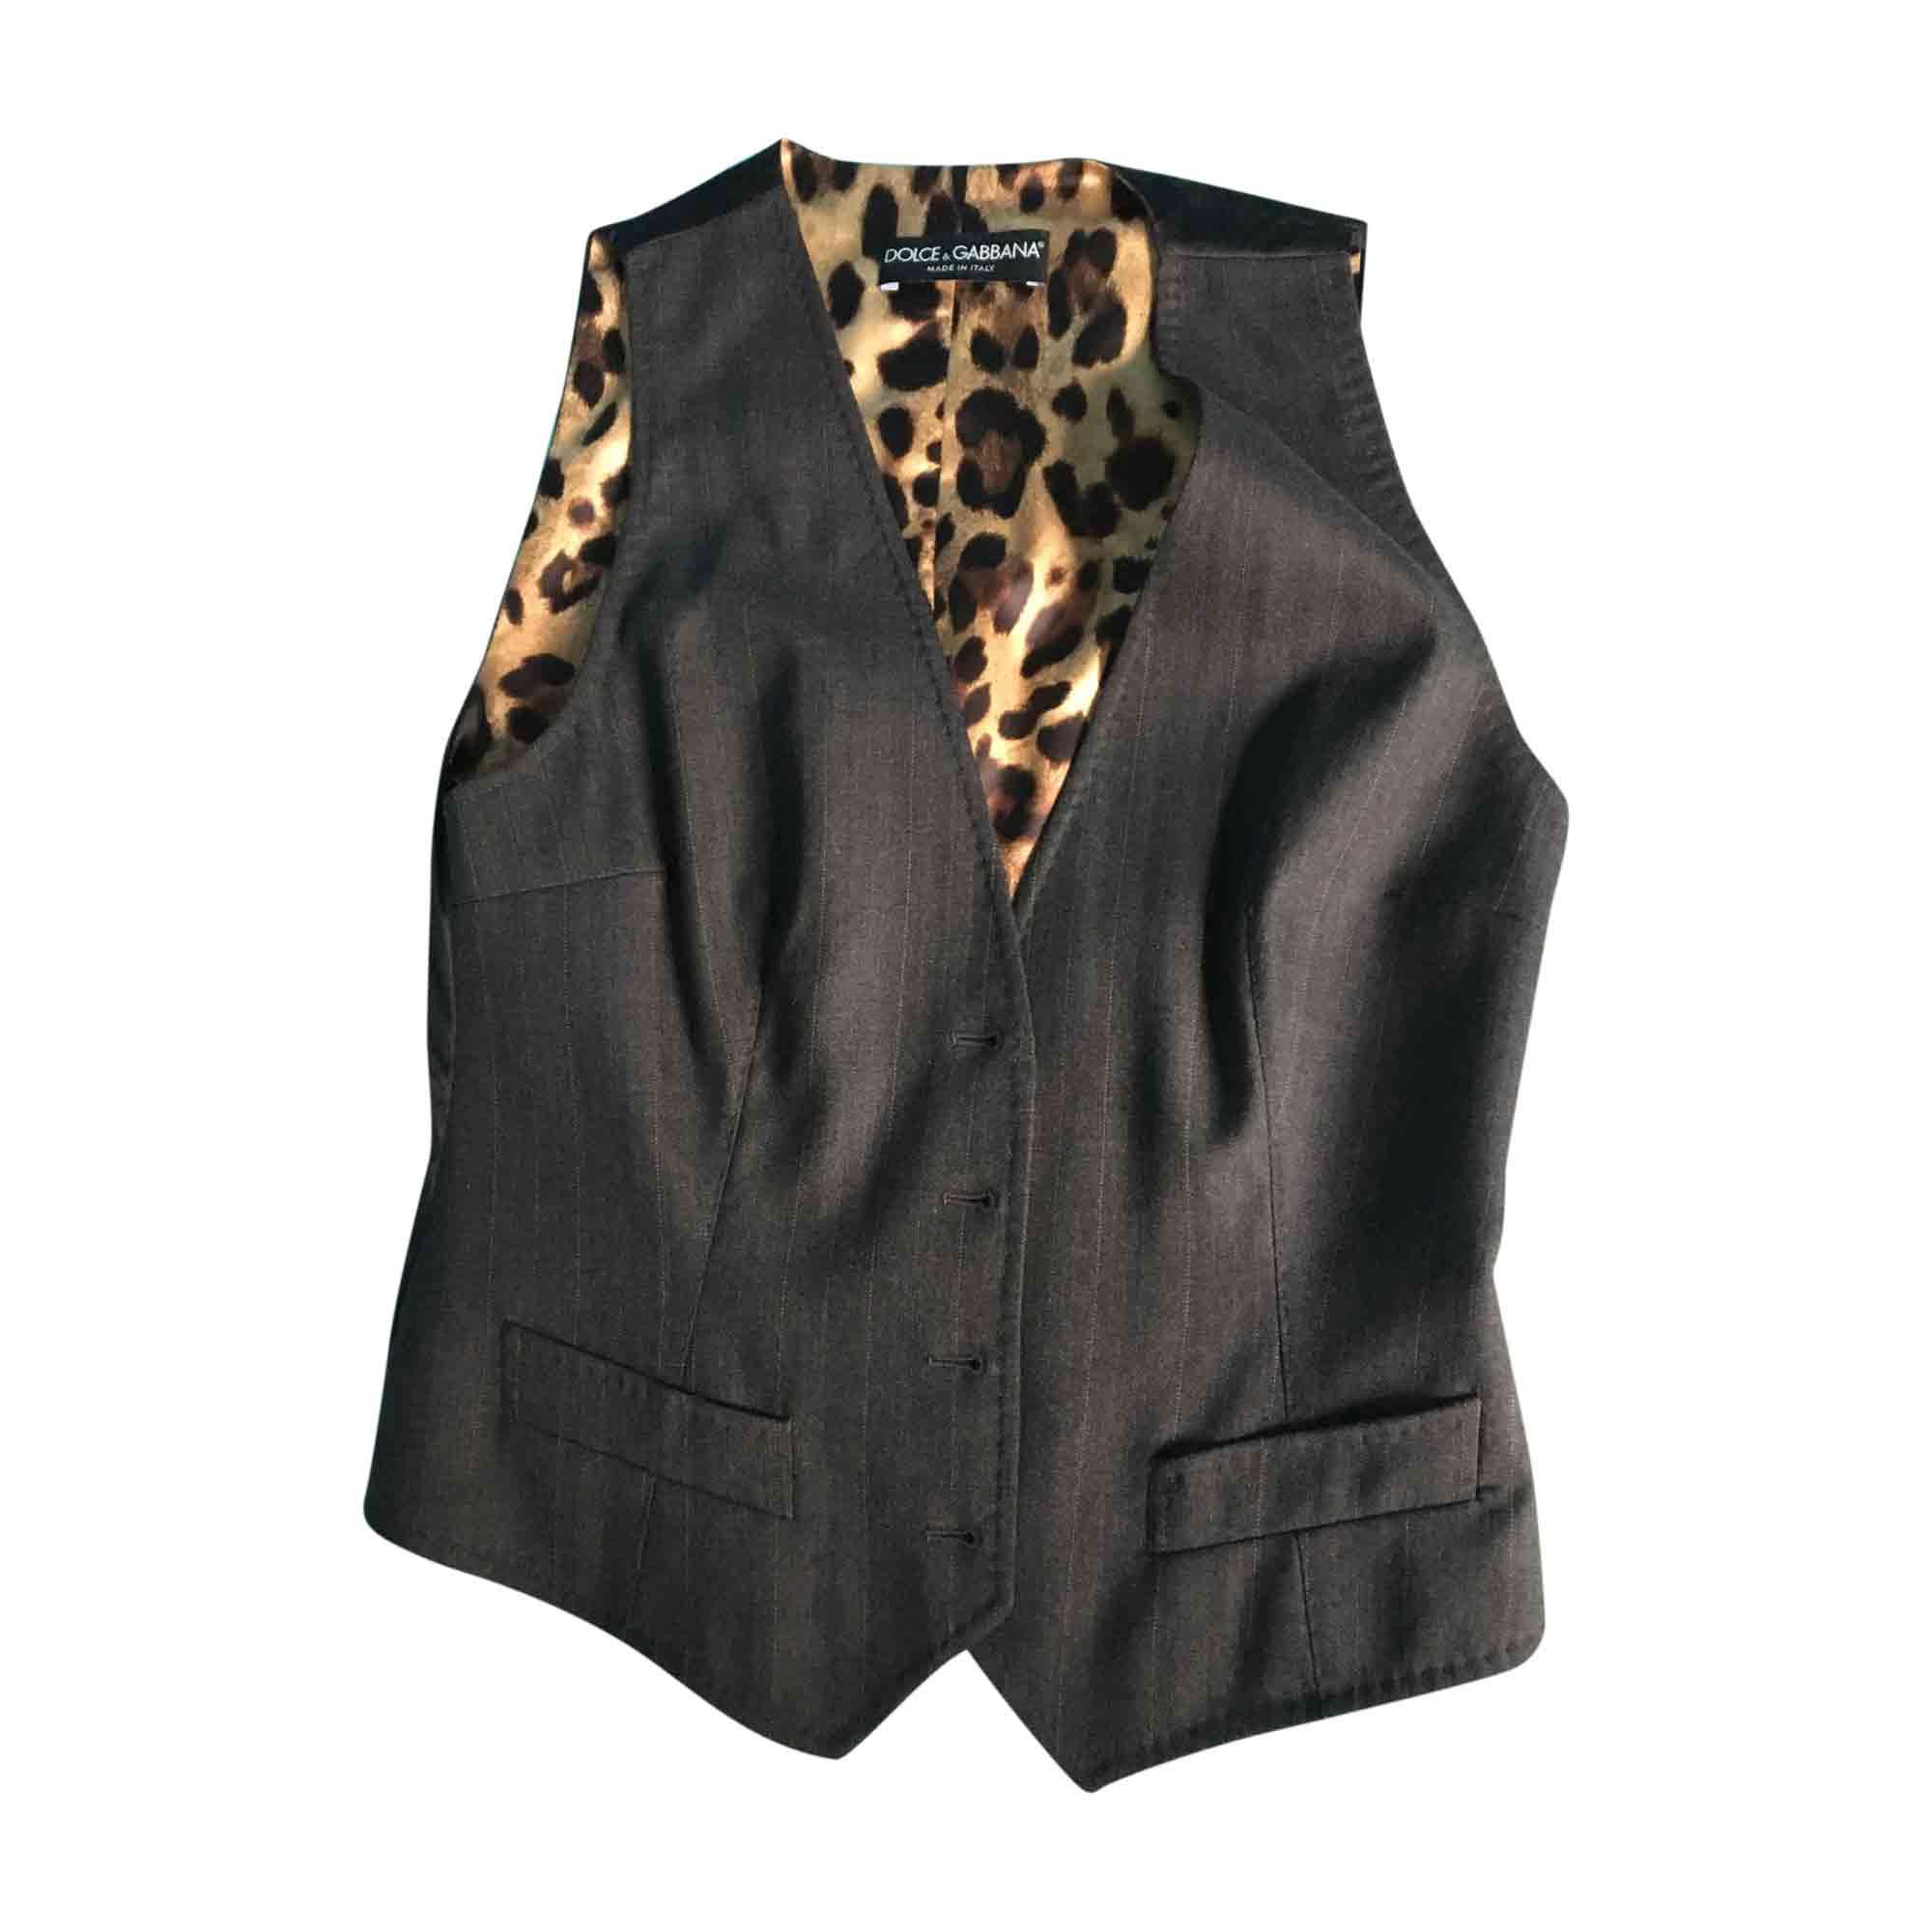 Tailleur pantalon DOLCE & GABBANA Gris, anthracite